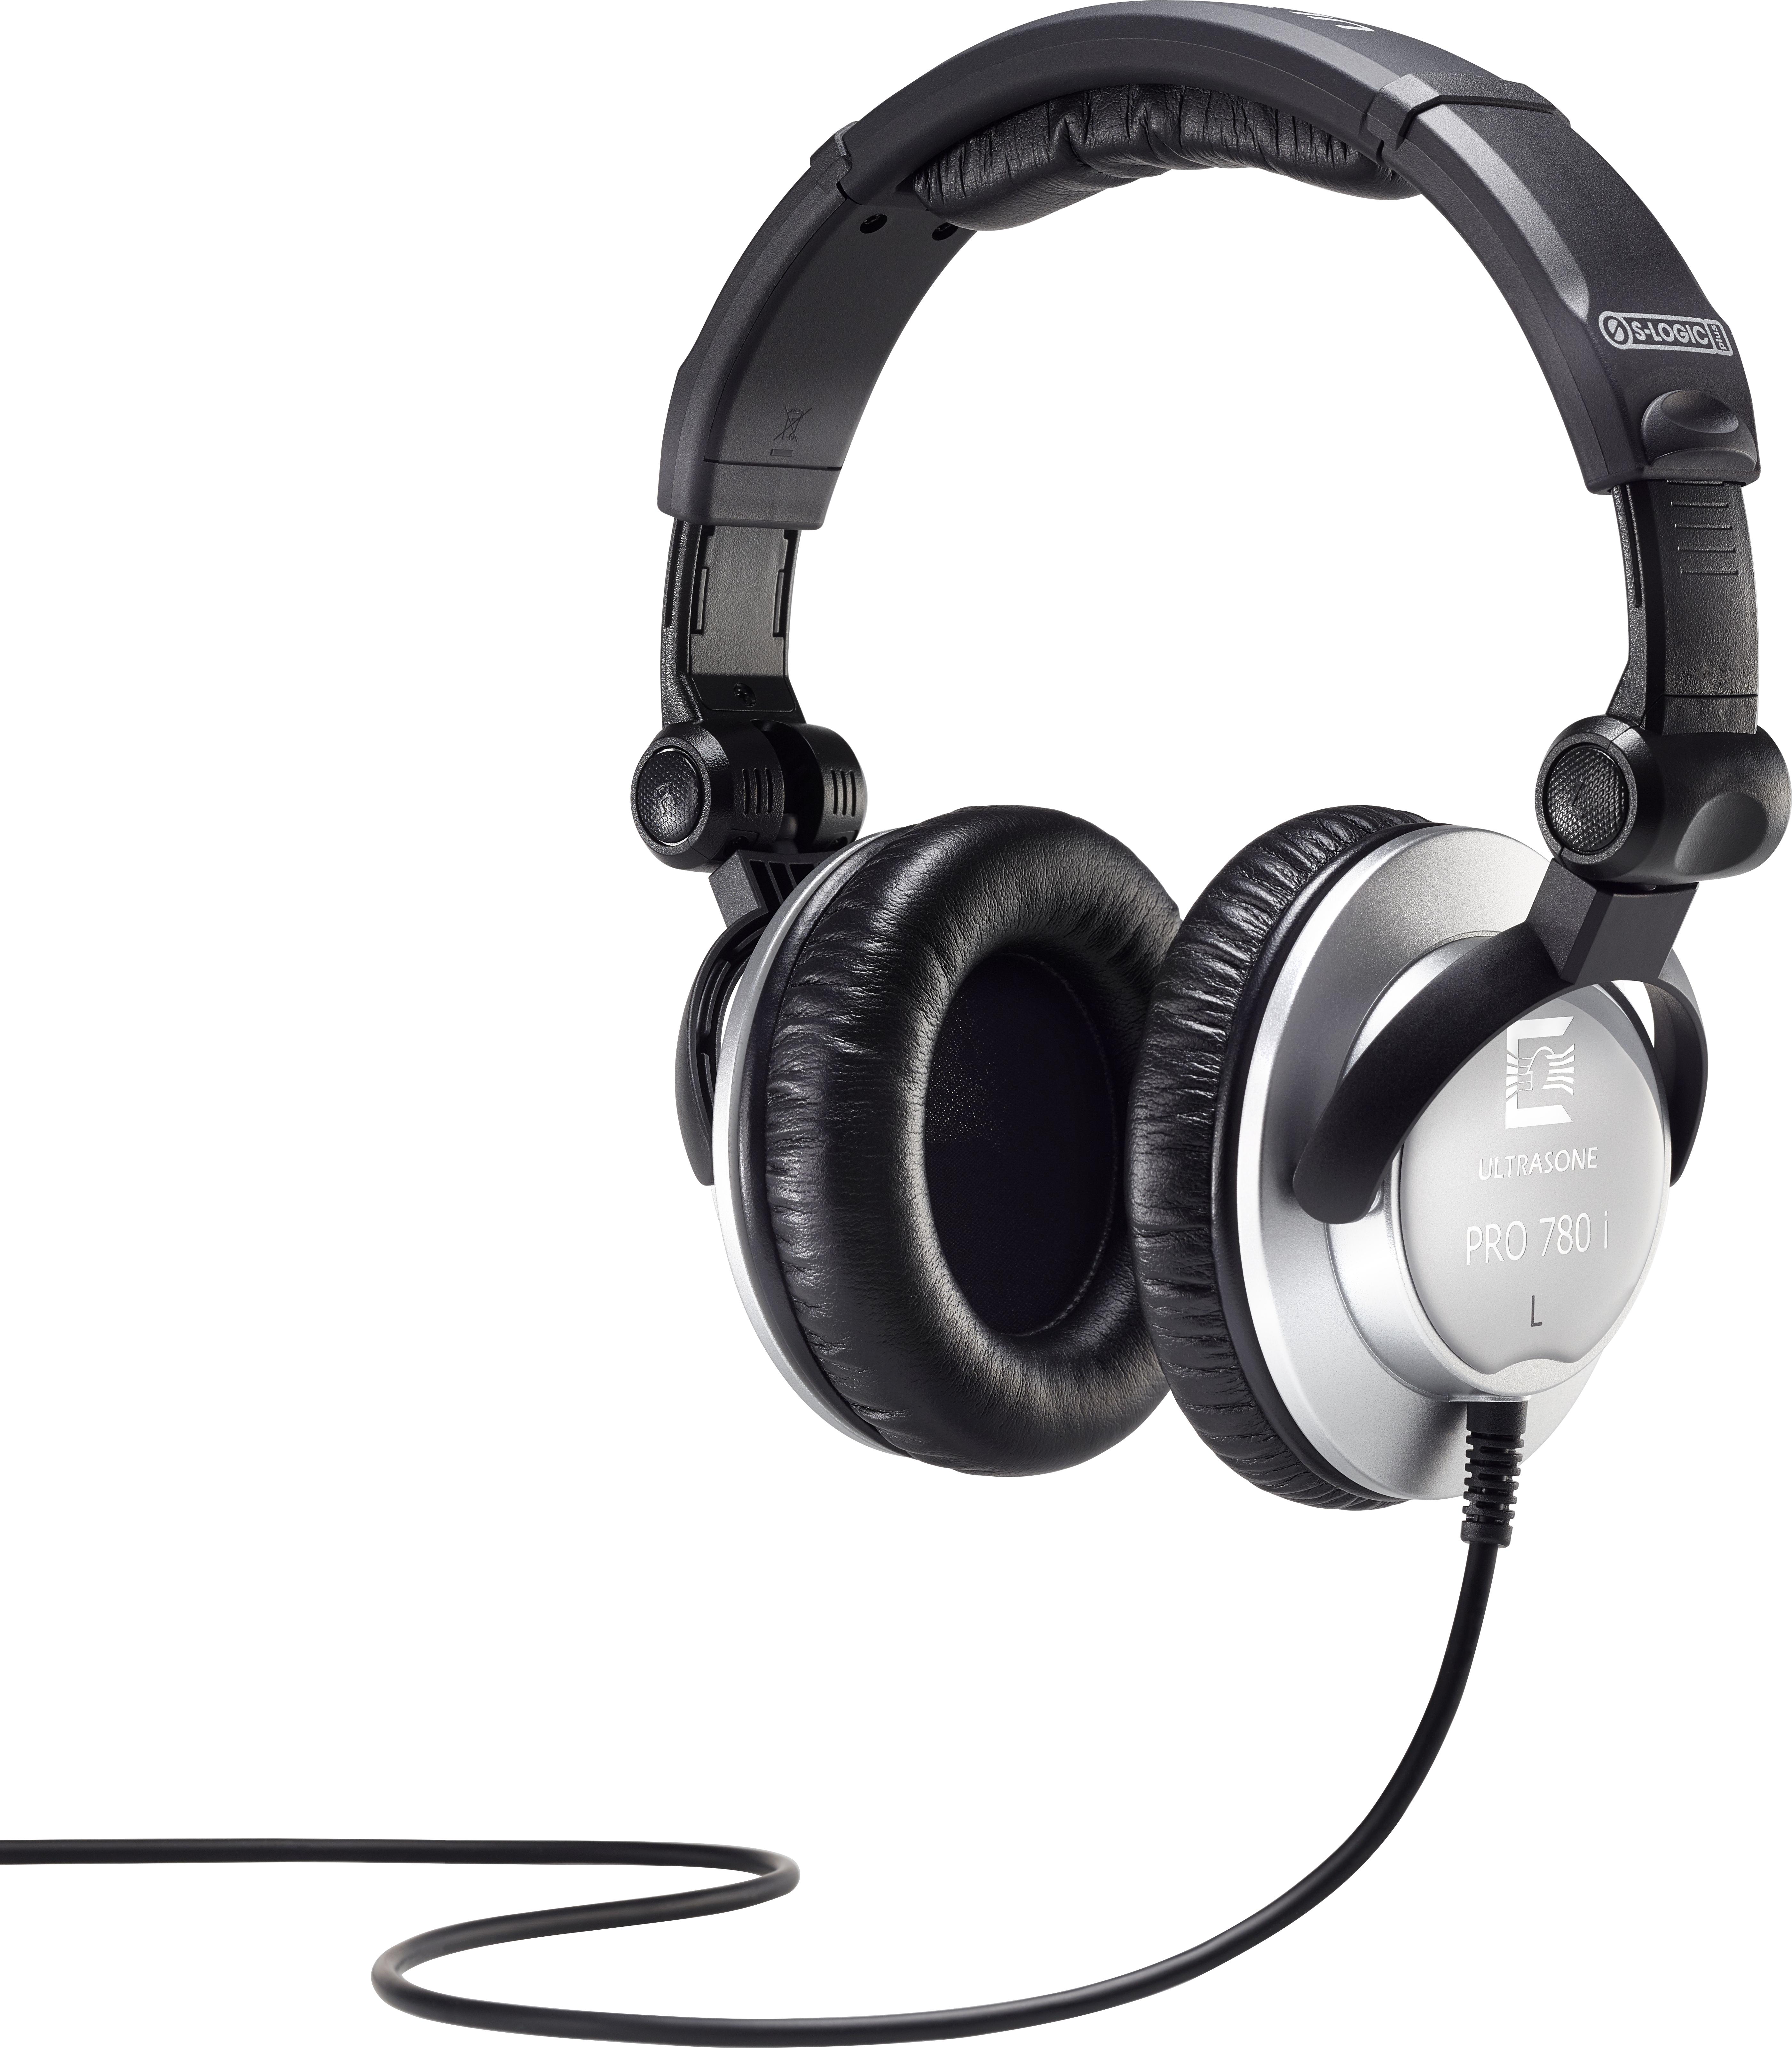 audio - CASQUES, ECOUTEURS, EAR MONITOR - CASQUES - ULTRASONE - ULTPRO780 - Royez Musik